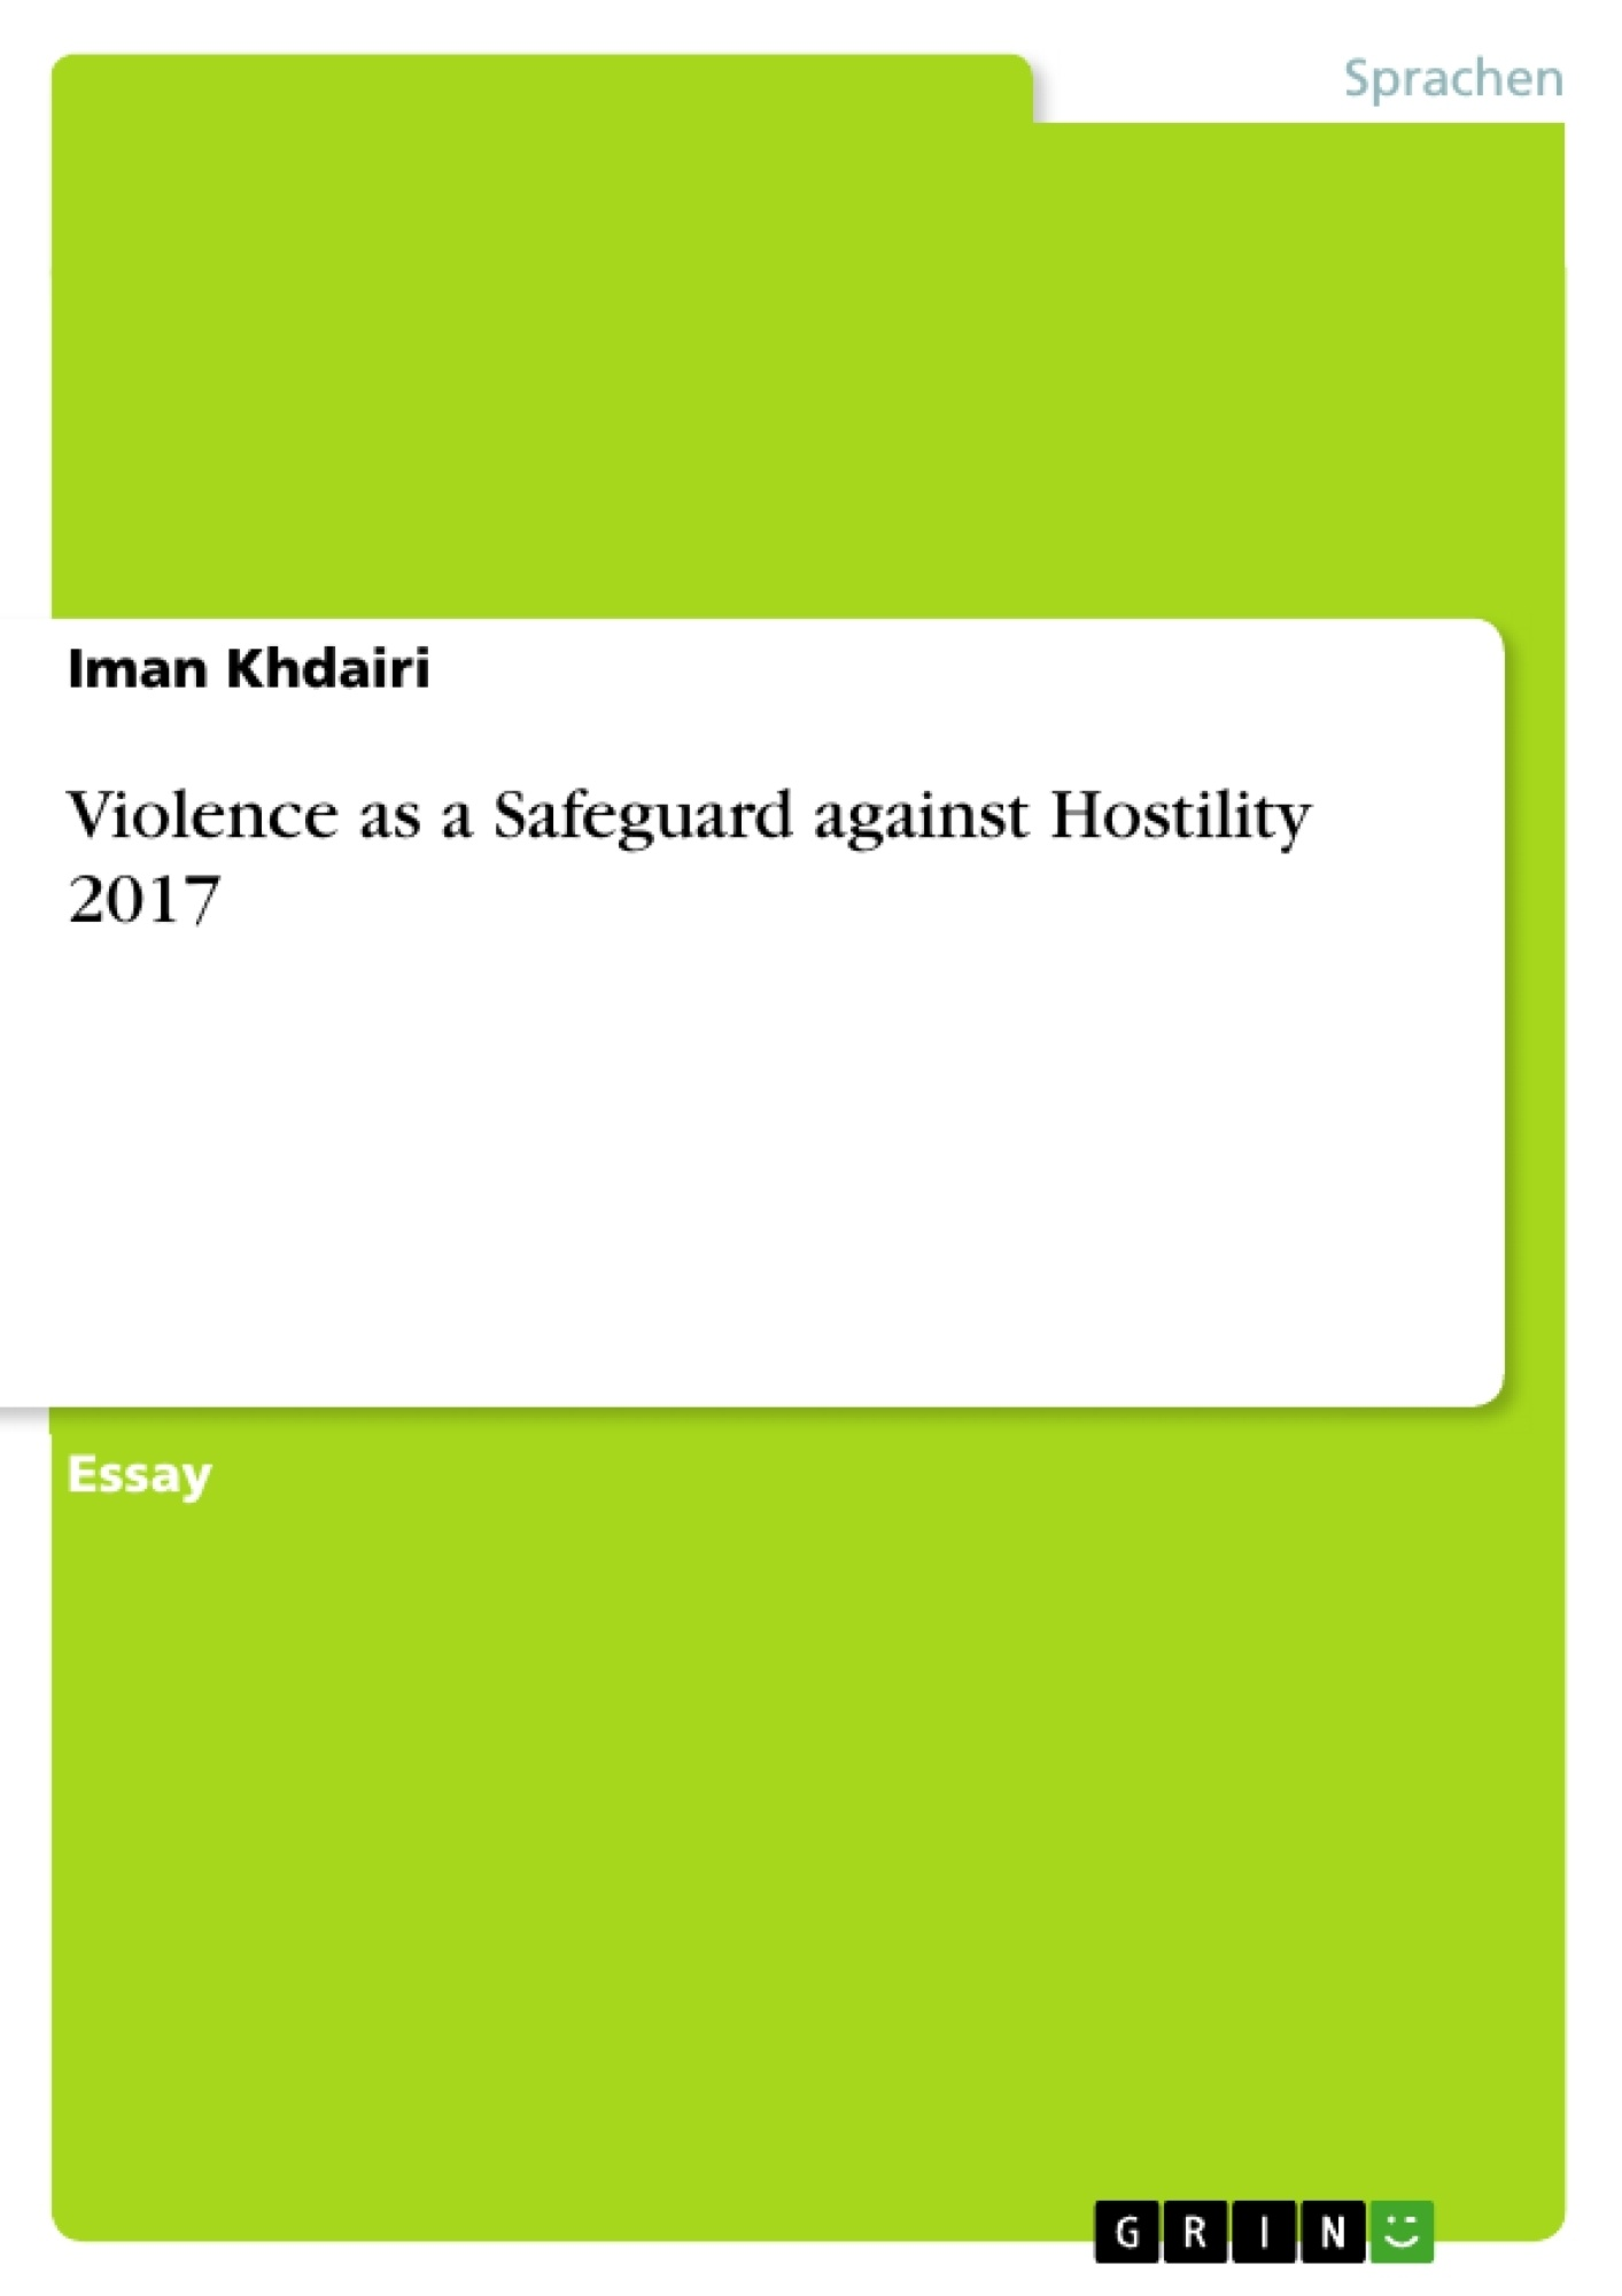 Titel: Violence as a Safeguard  against Hostility 2017